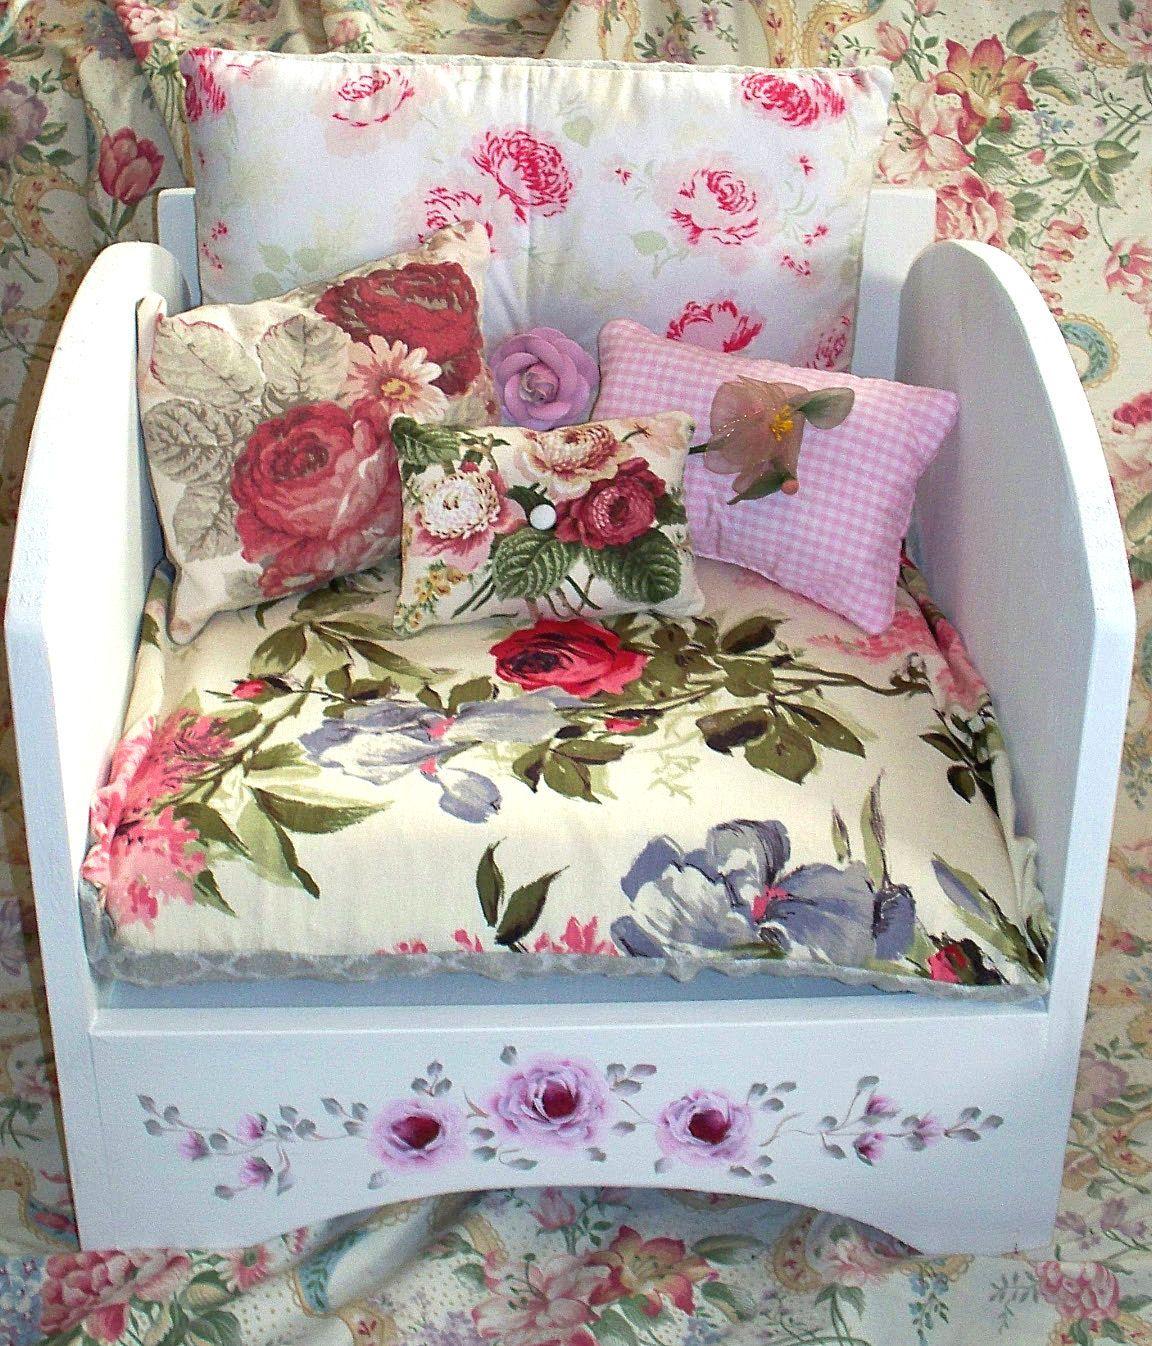 Beautiful Dog Bed,Cat Bed,Designer,Shabby Chic Handpainted Roses,Handmade  Pillows,Orthopedic Memory Foam Pillow,Wood,Hand Painted